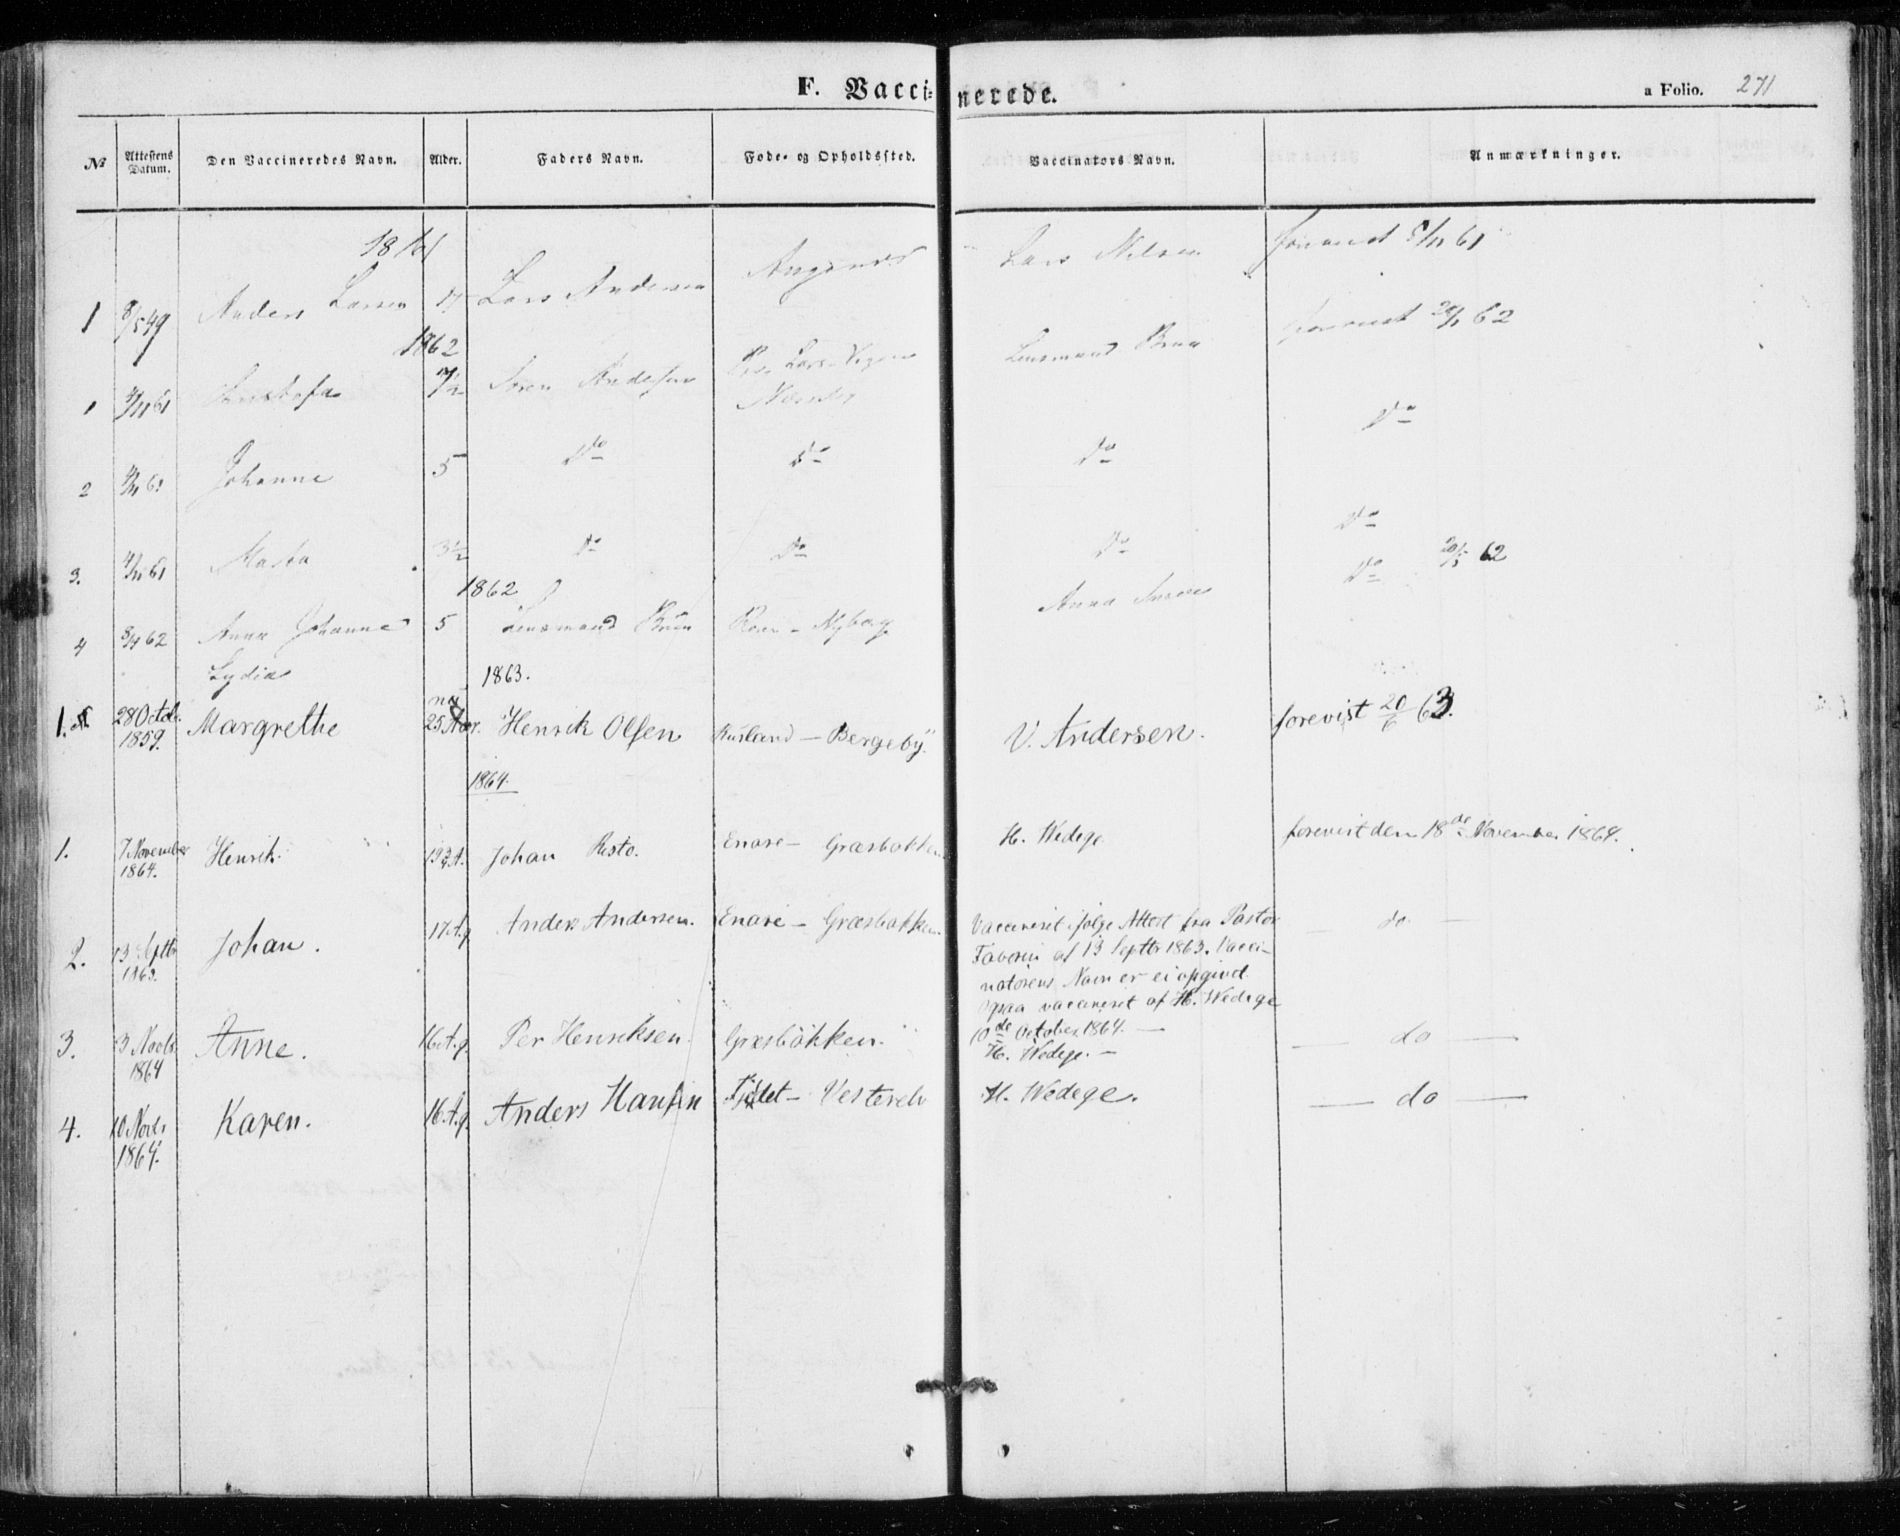 SATØ, Nesseby sokneprestkontor, H/Ha/L0002kirke: Parish register (official) no. 2, 1856-1864, p. 271